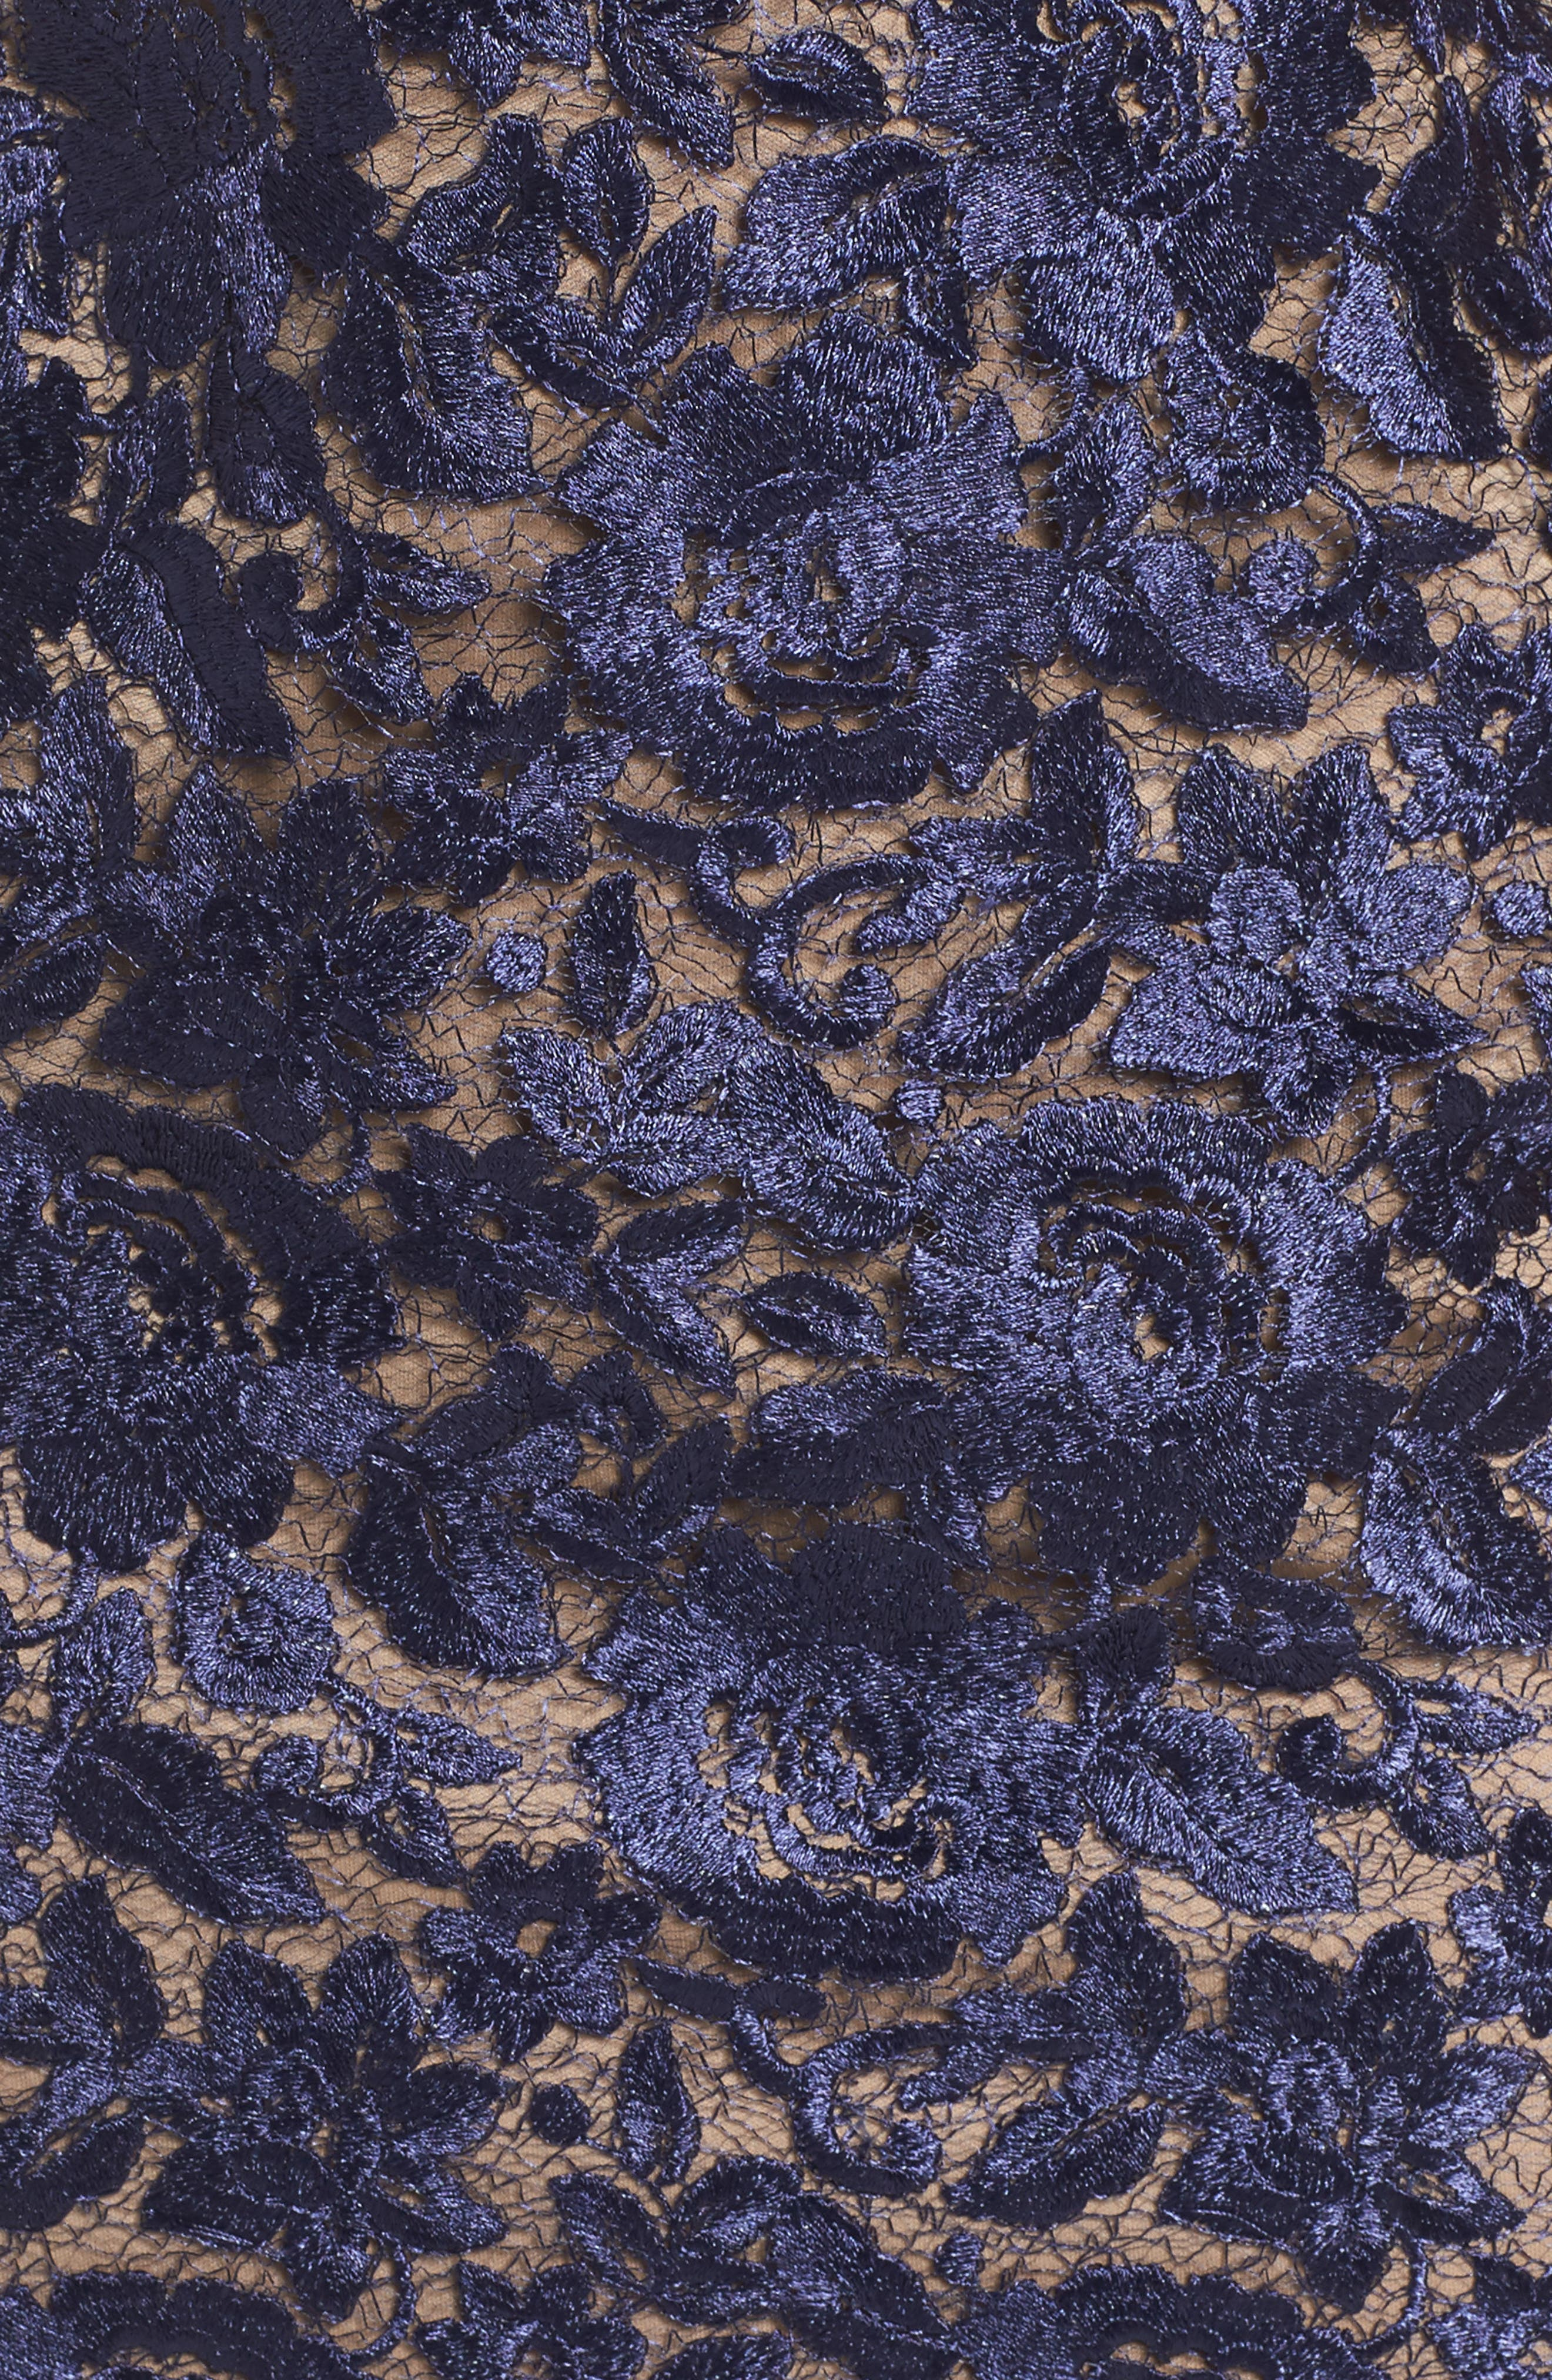 Illusion Lace Sheath Dress,                             Alternate thumbnail 5, color,                             001